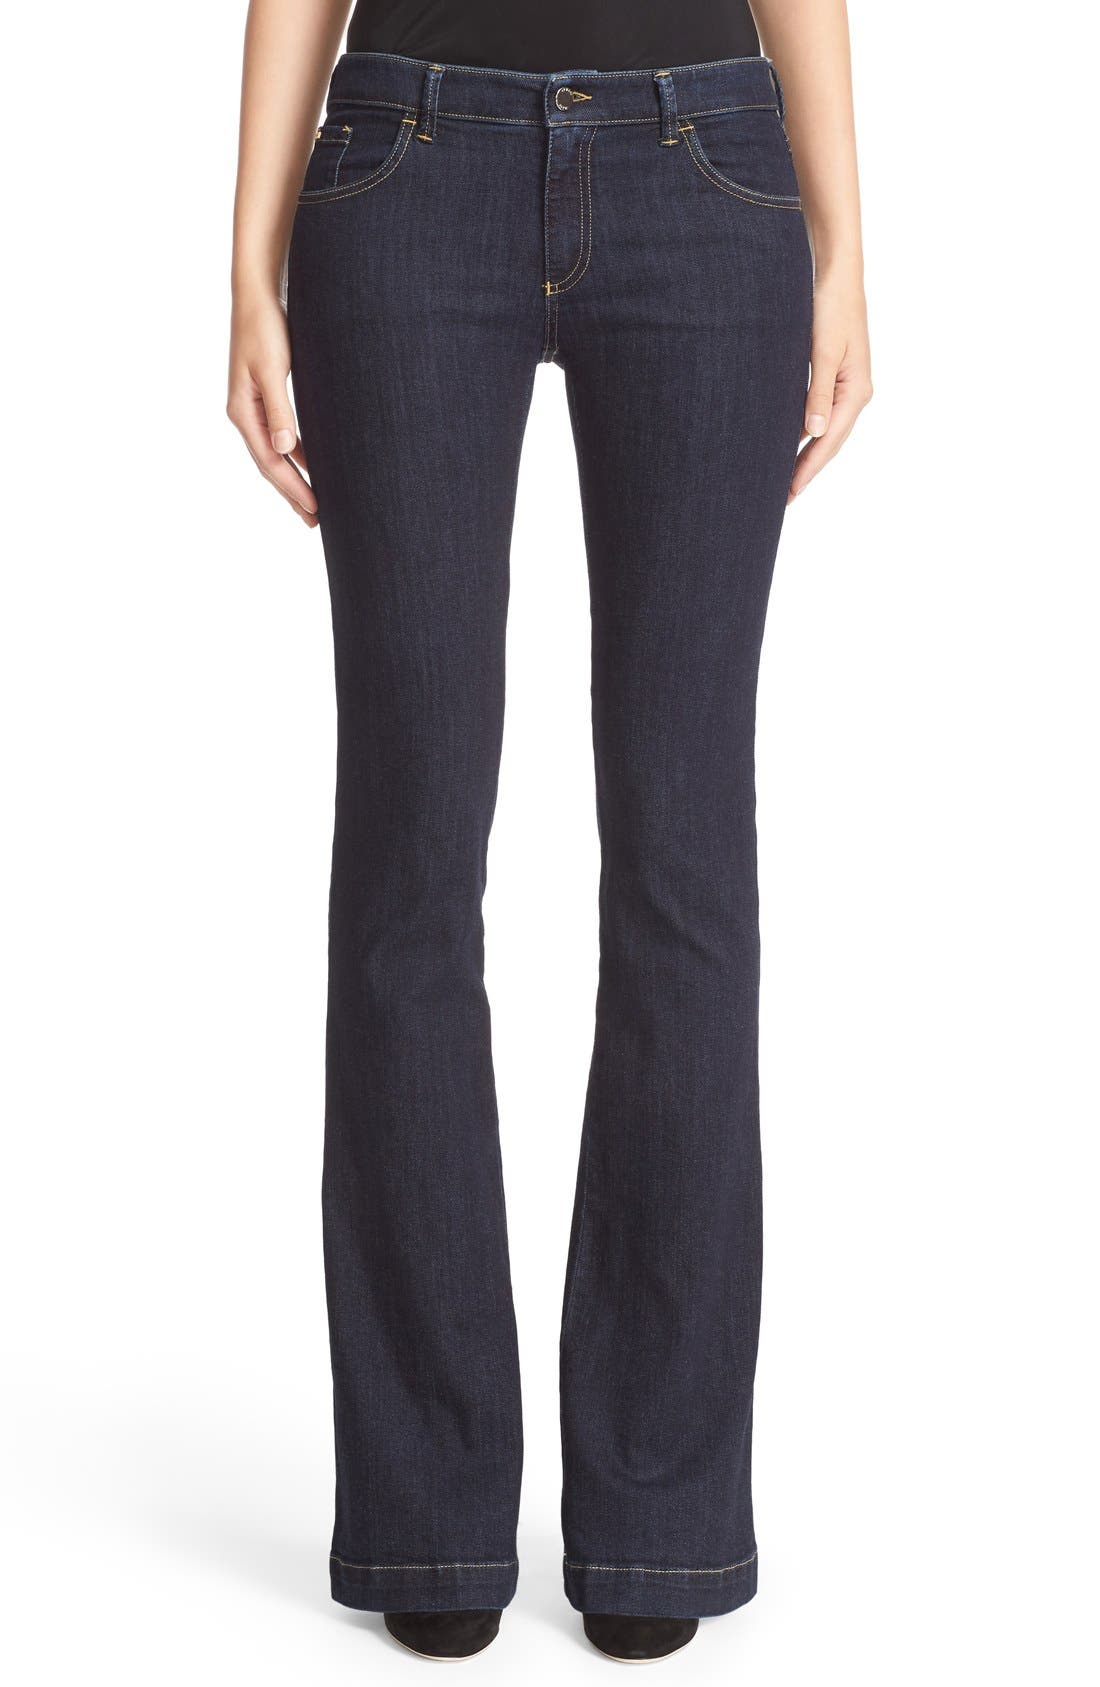 Armani Jeans Bootcut Jeans,                             Main thumbnail 1, color,                             400